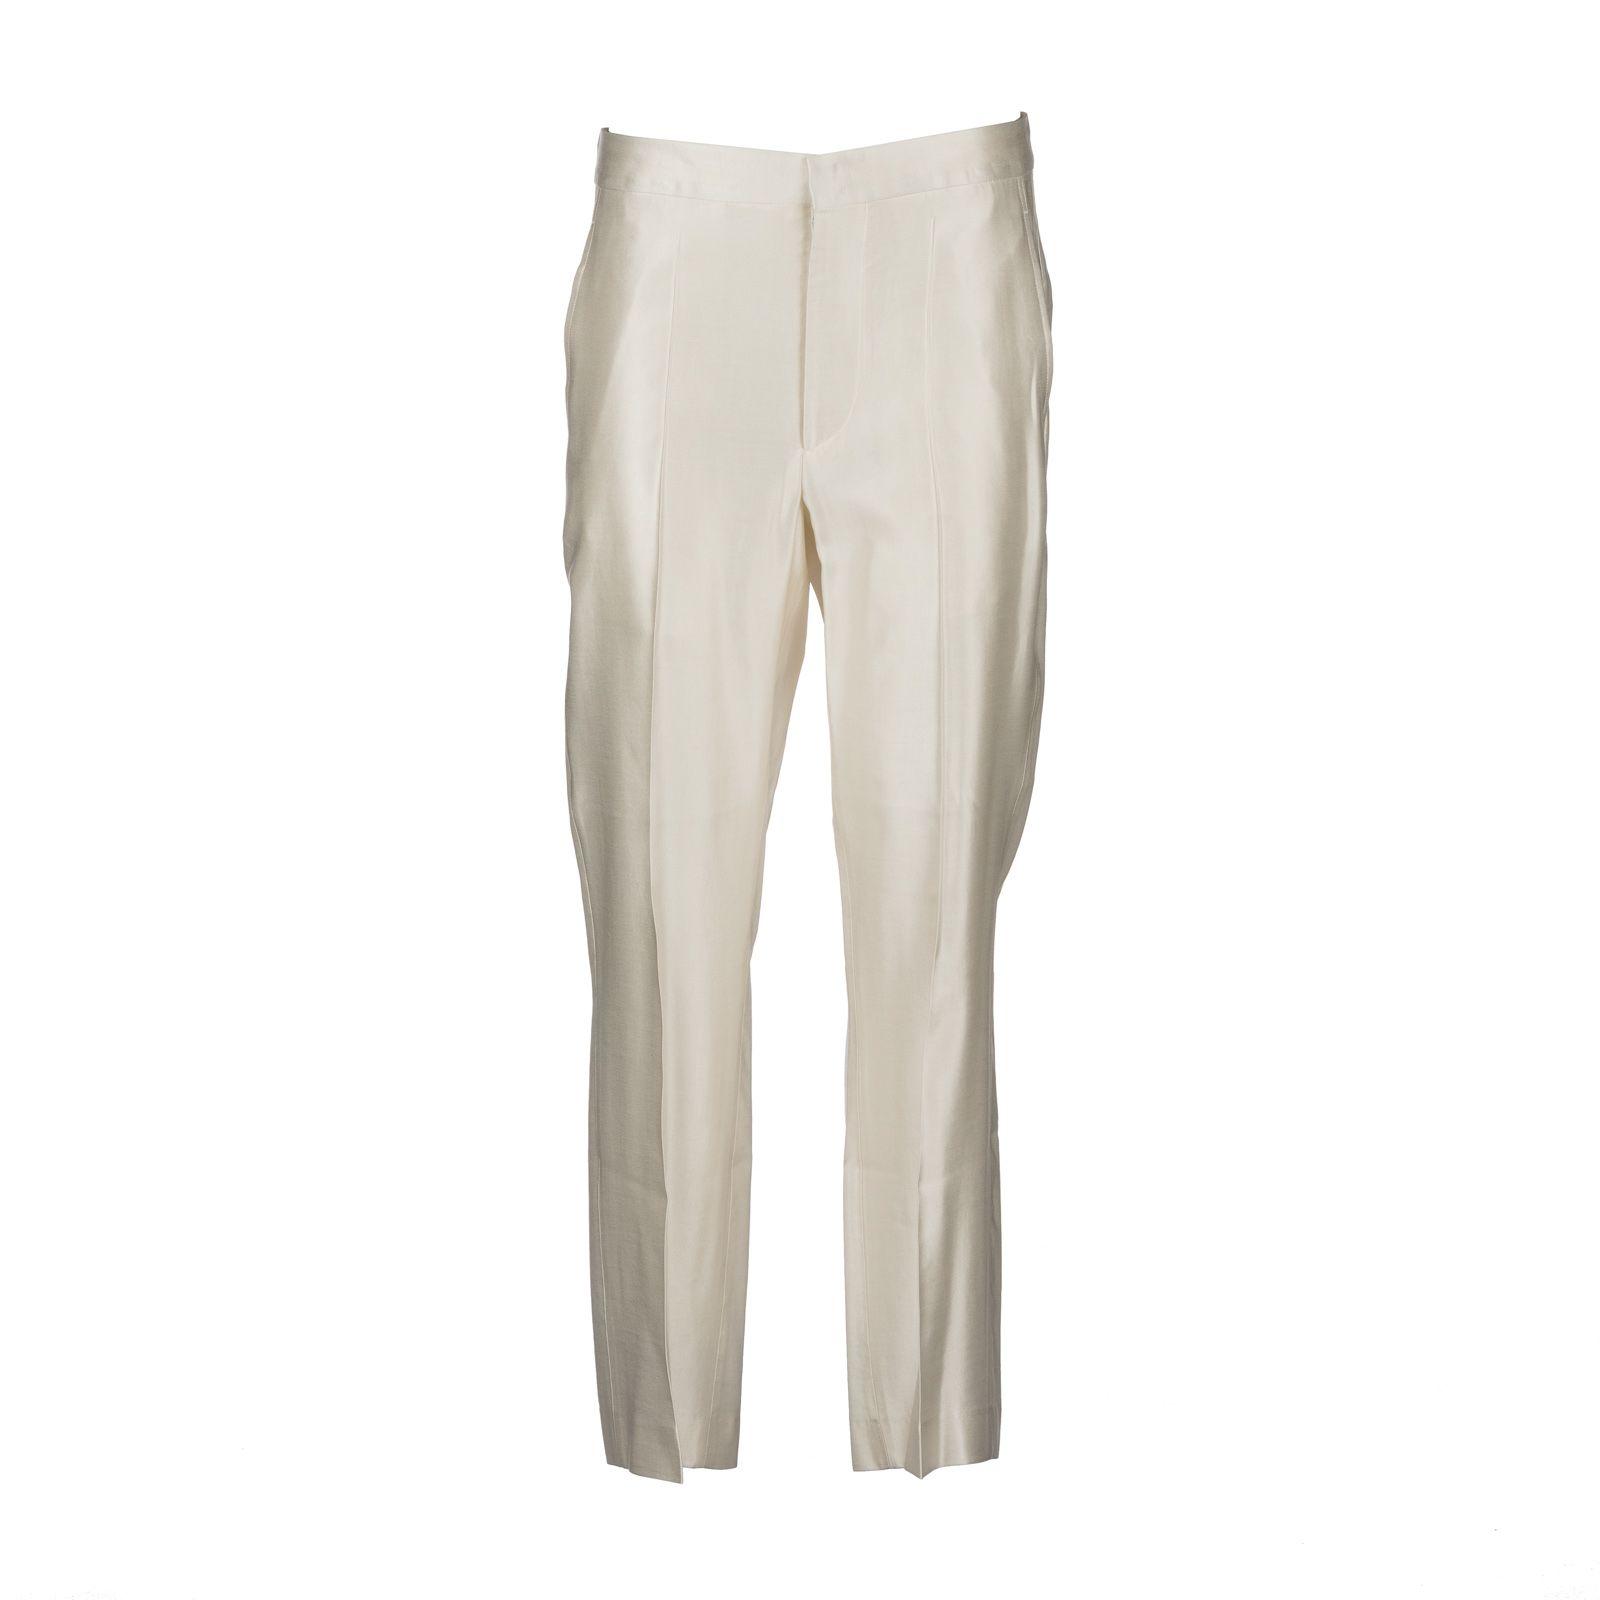 Isabel Marant Roan Trousers